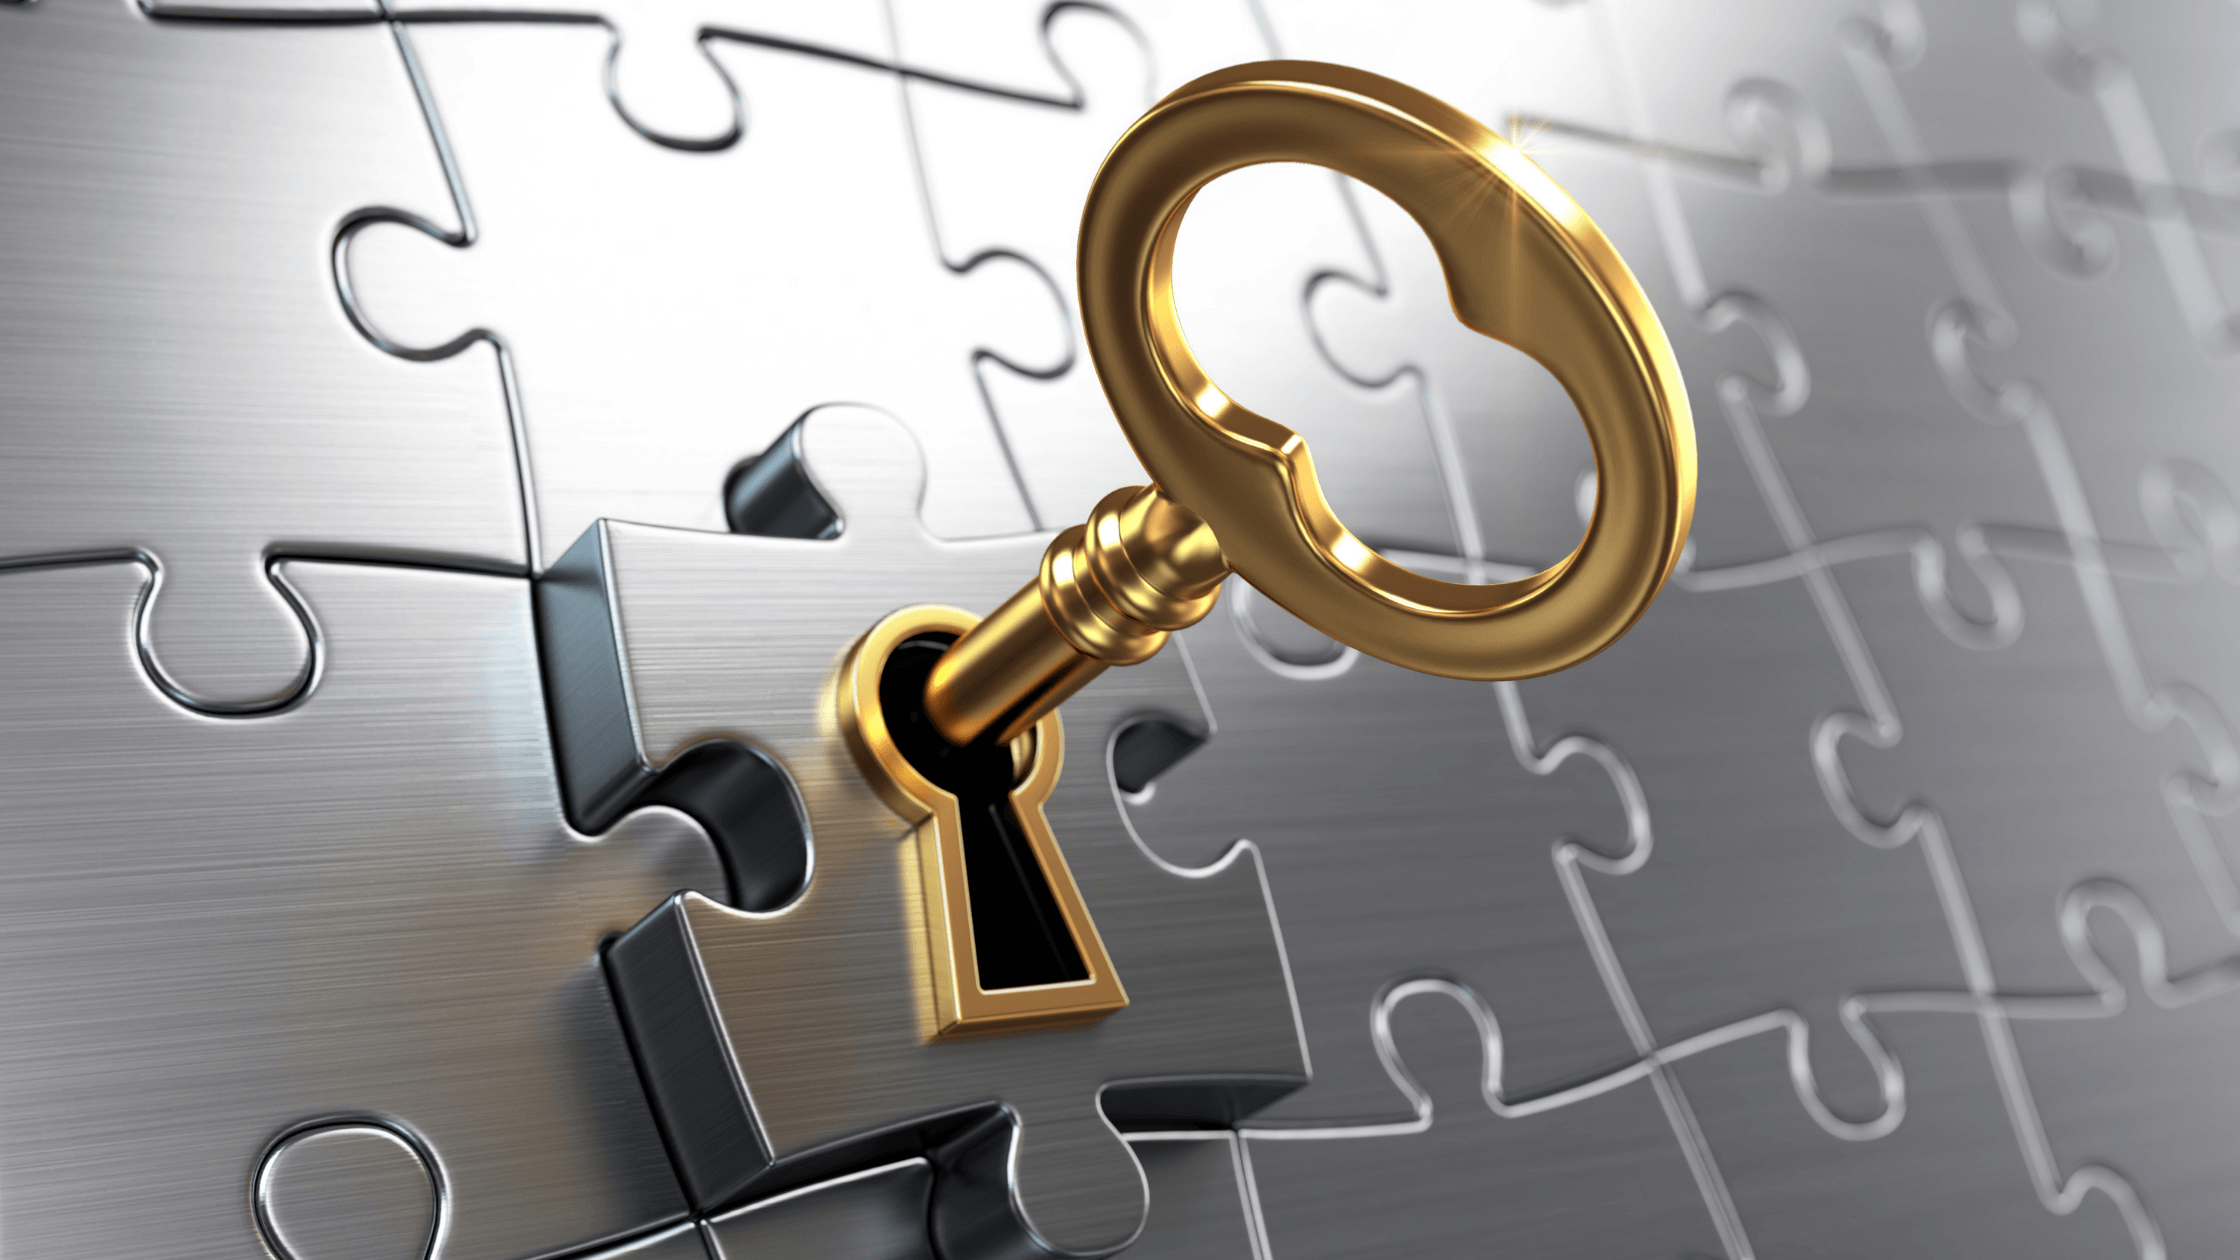 key-keys to spiritual growth